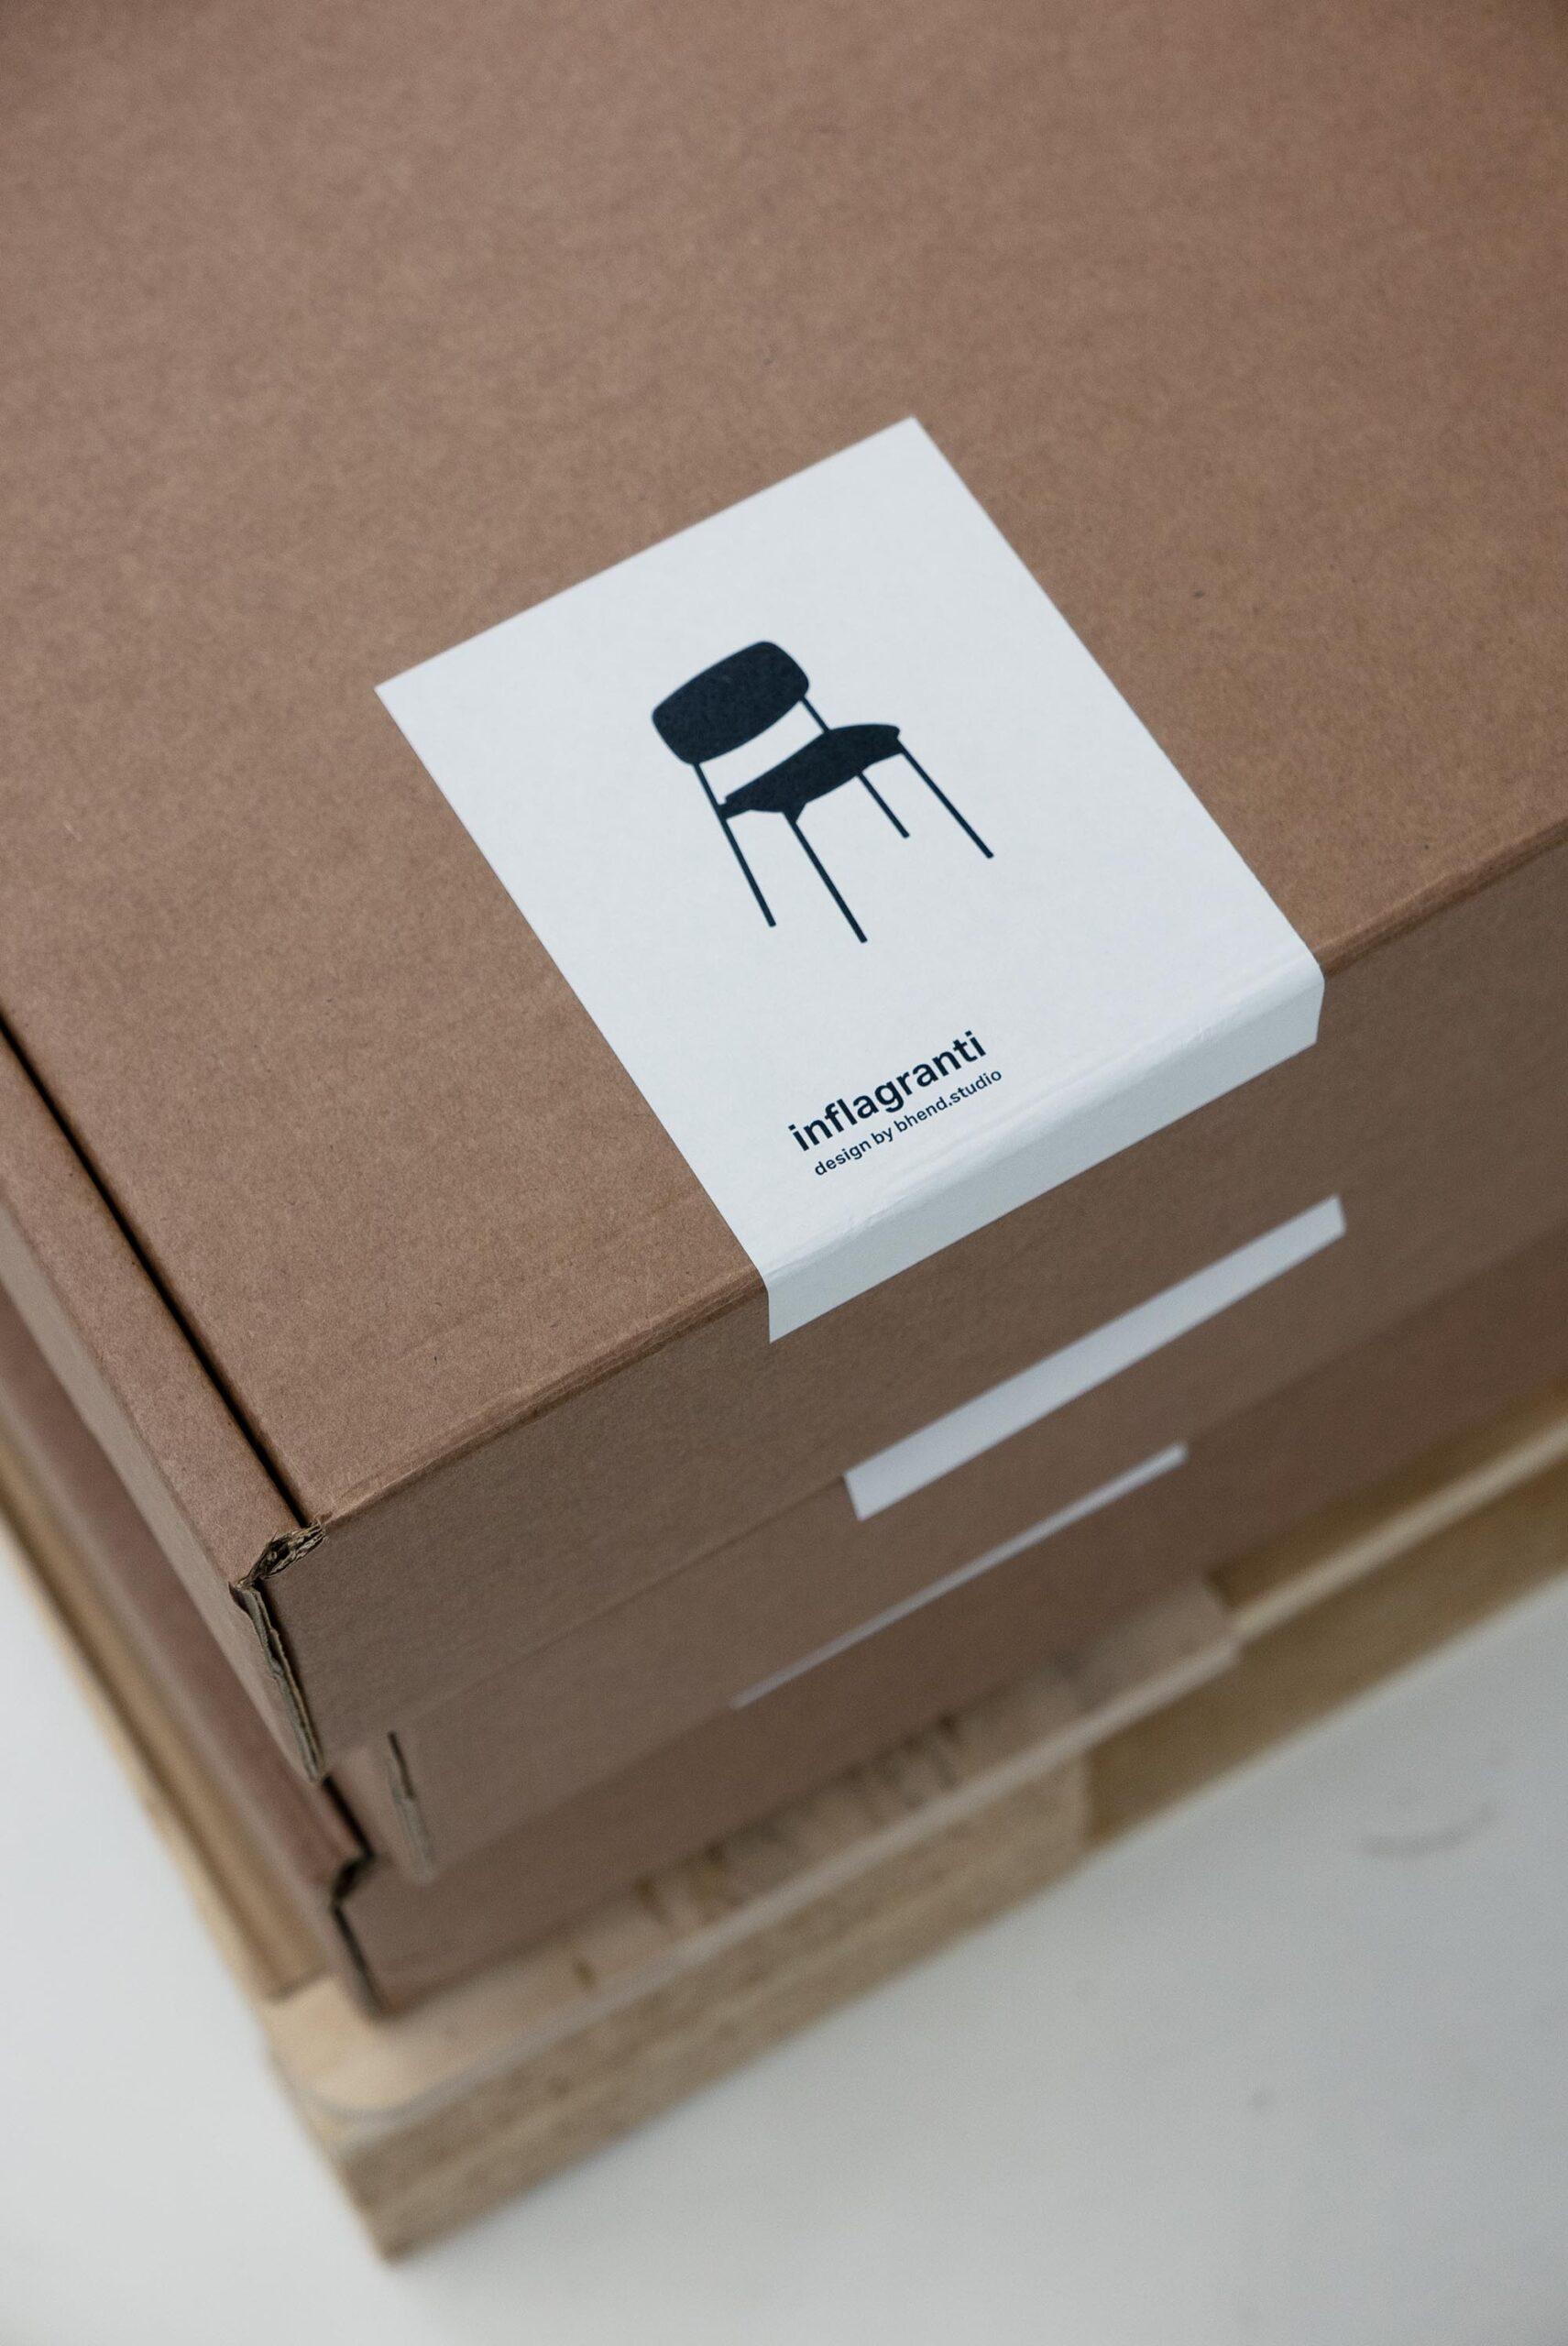 Andreas Bhend Industrial Design Studio inflagranti – 006